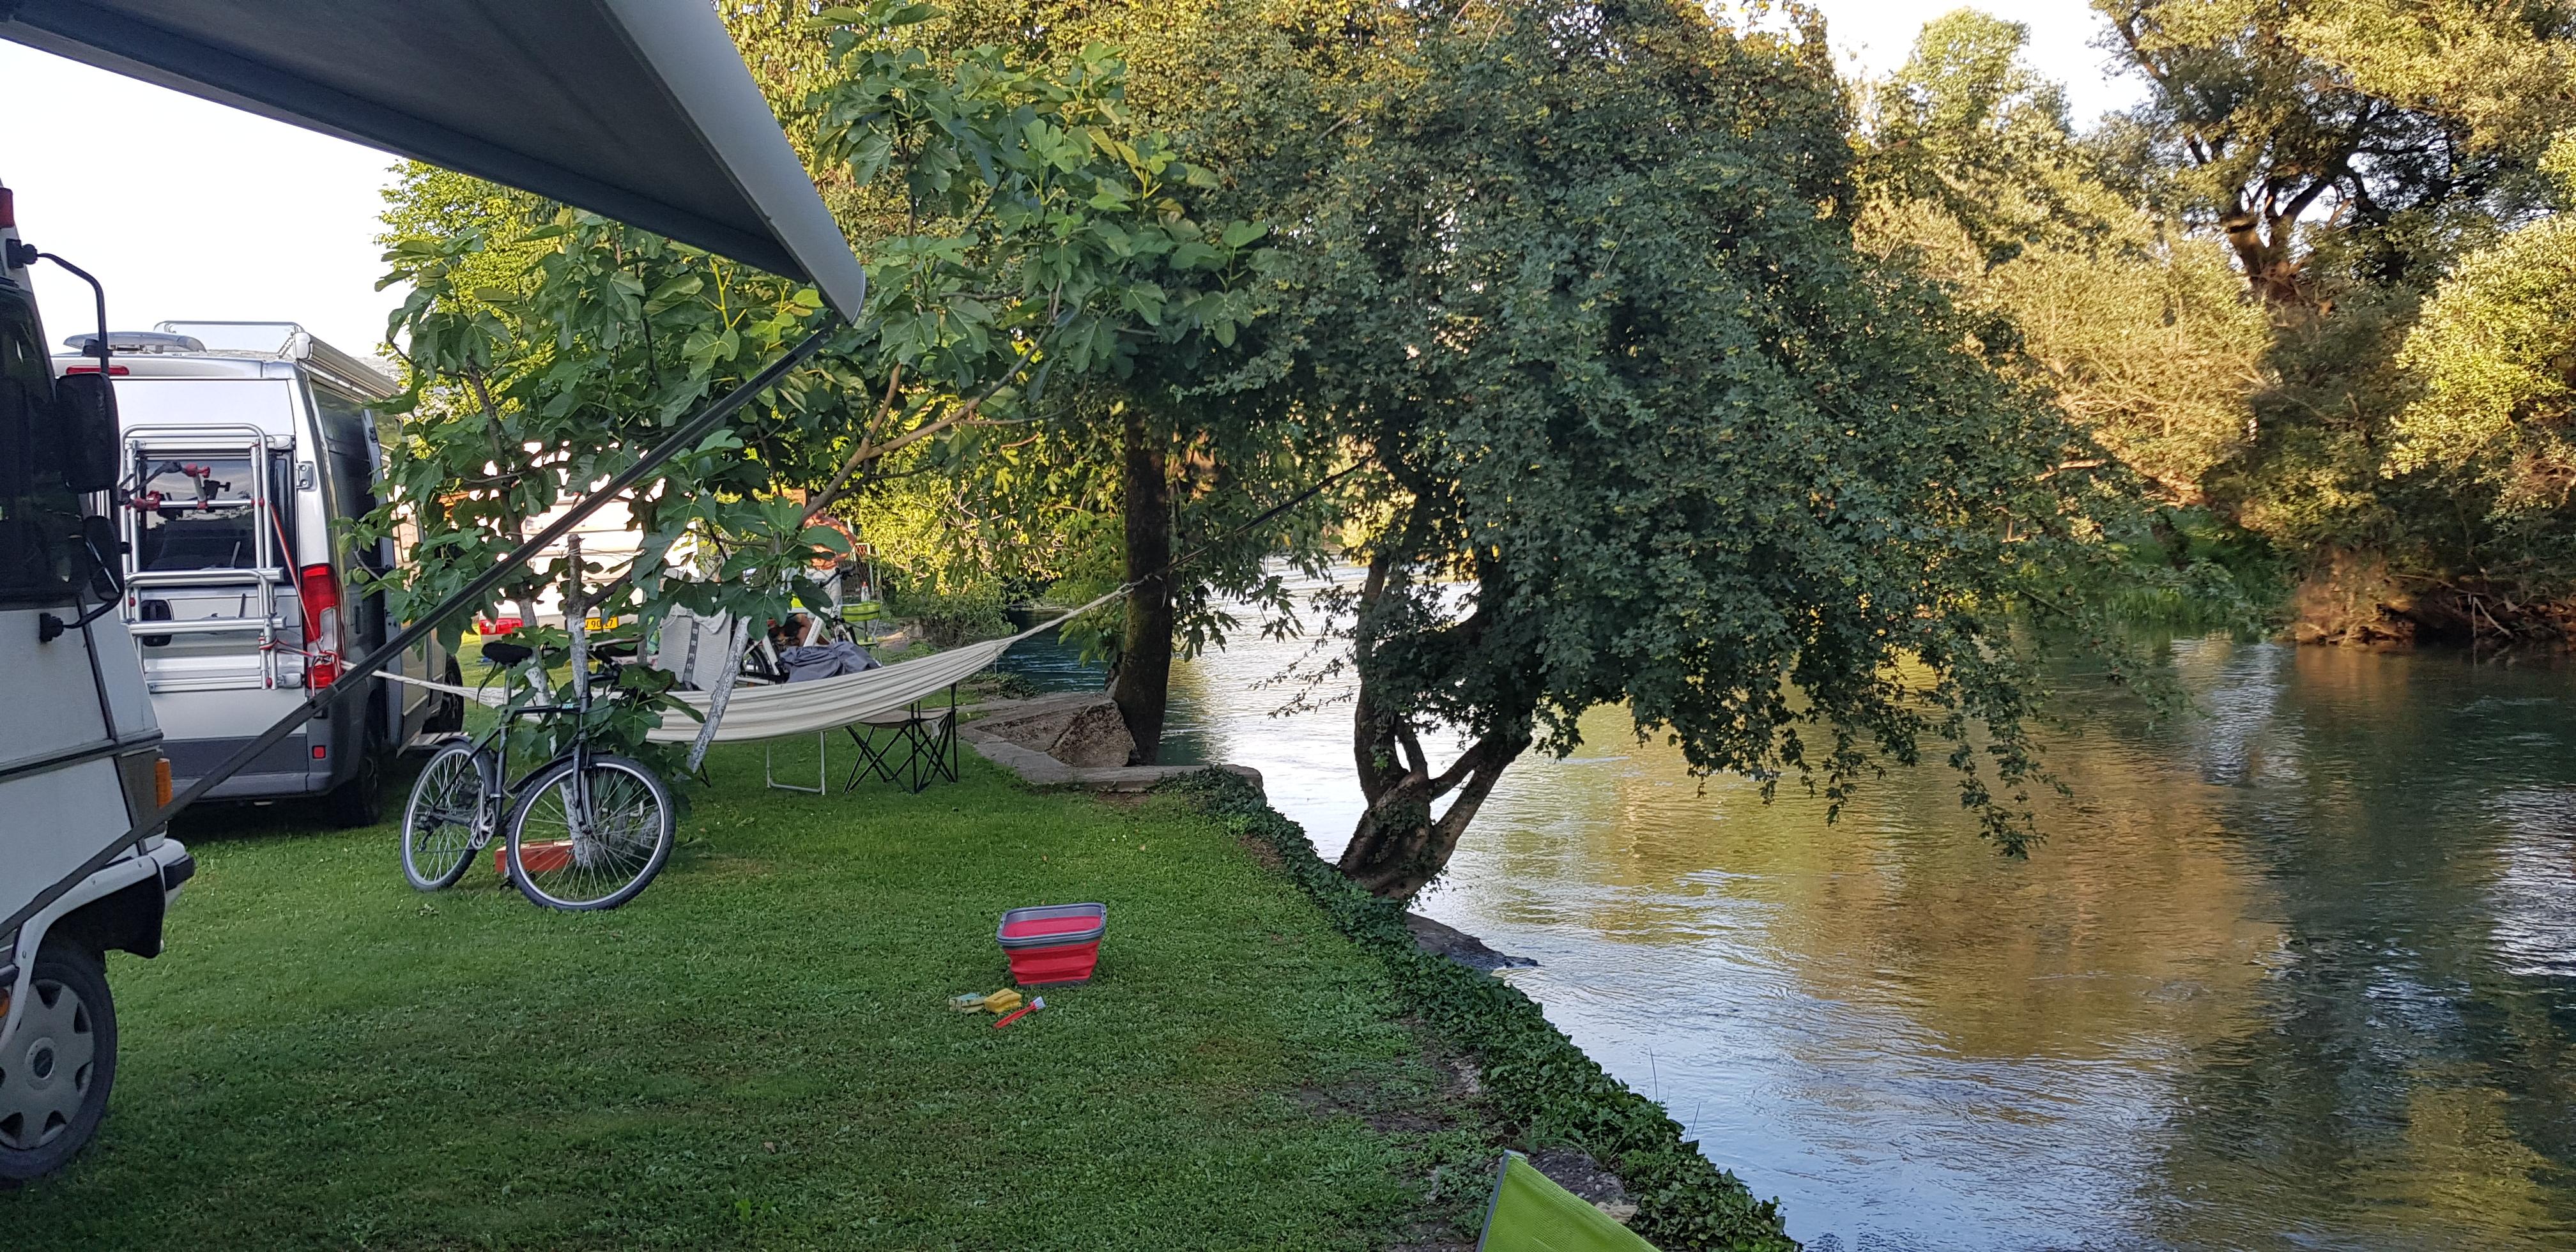 Camping at EKO camping in Blagaj in Bosnia